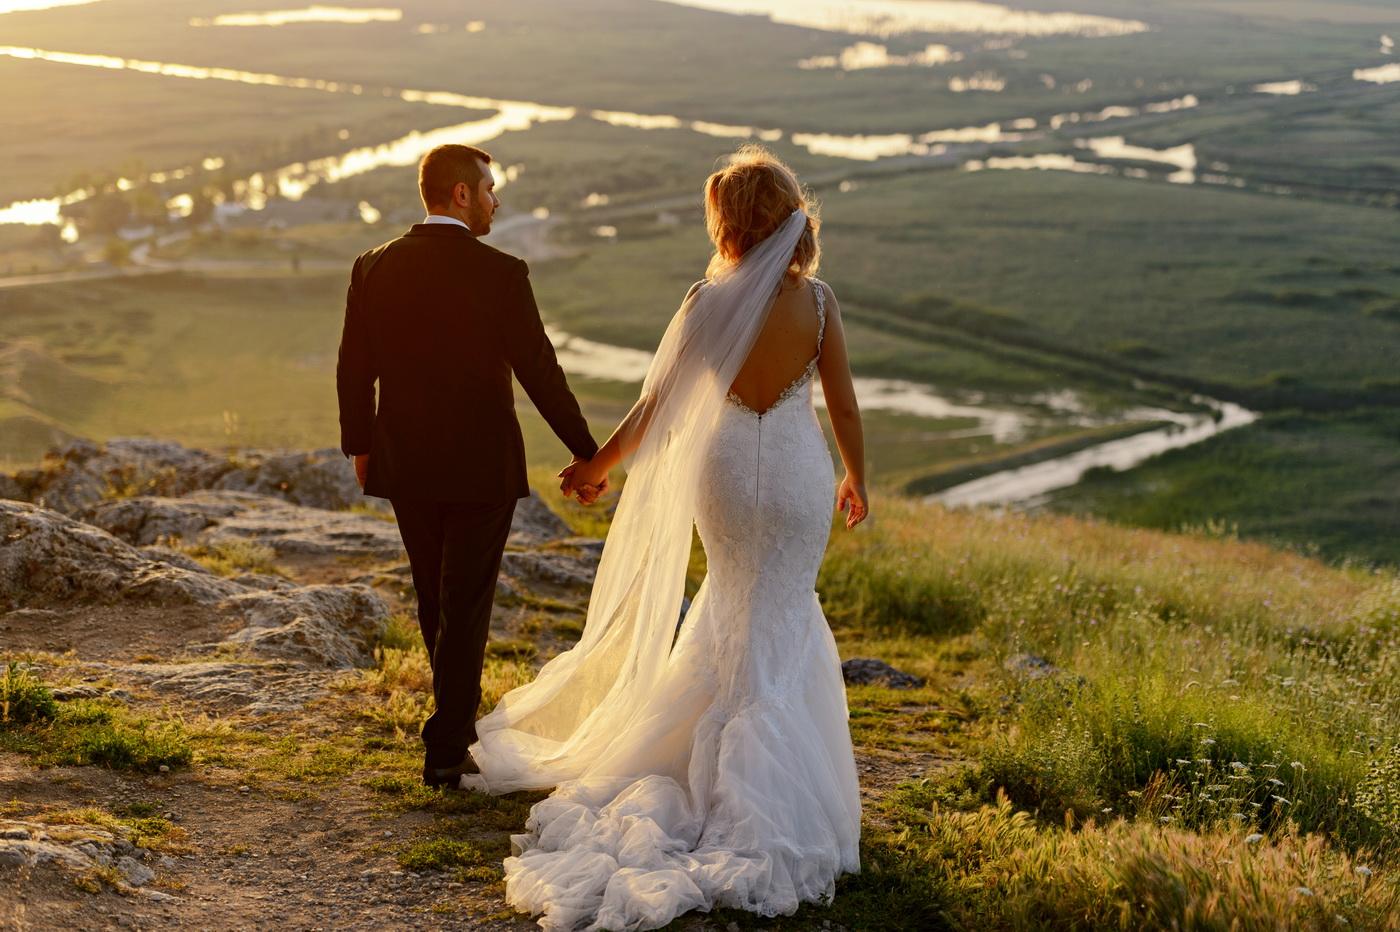 Destination Wedding Photographer_Marian Sterea_142.jpg